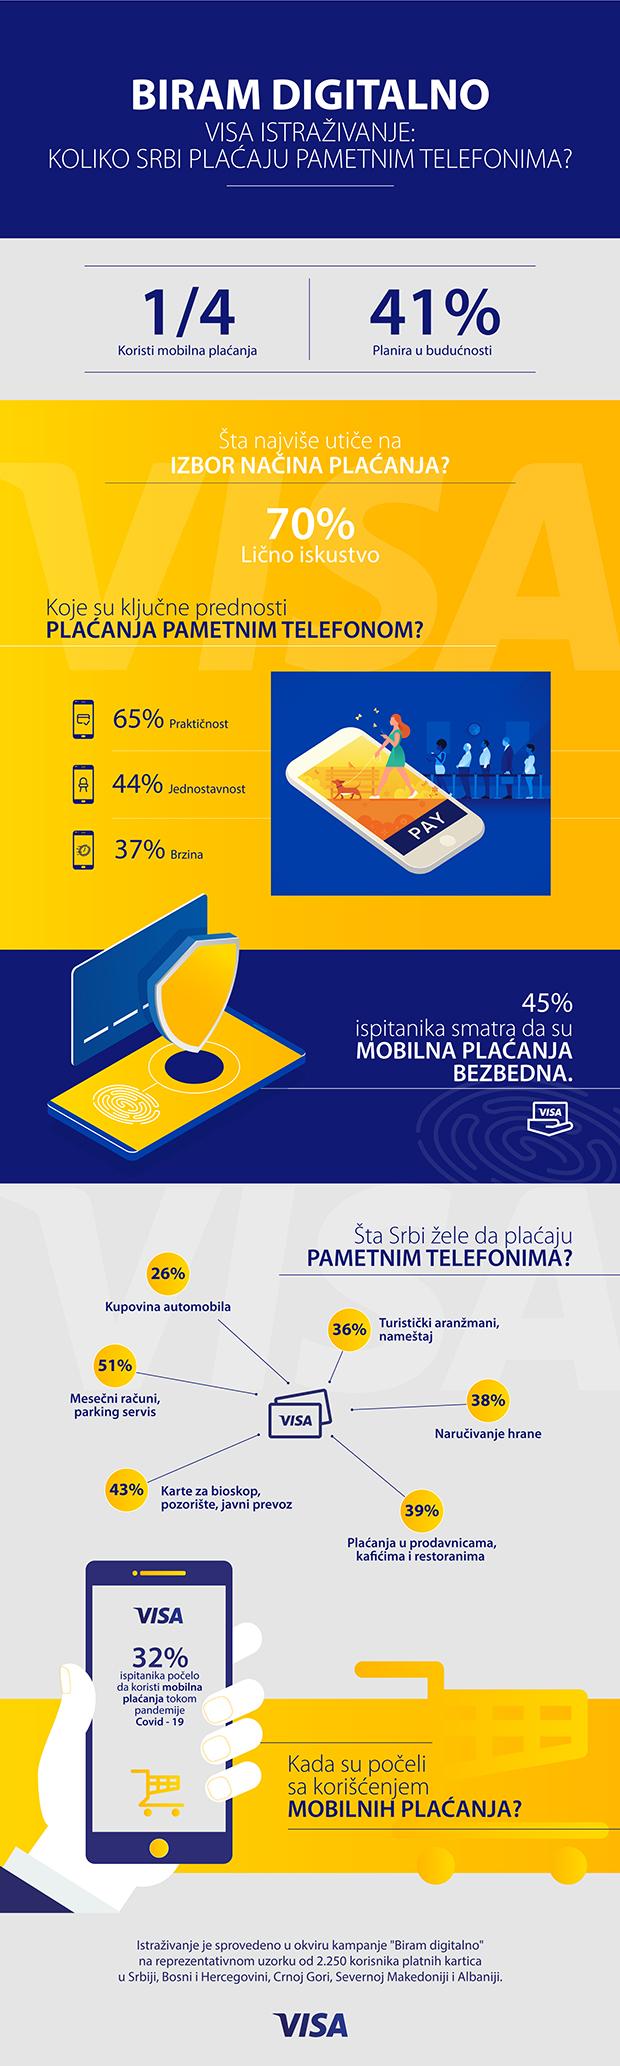 210406_Visa-infographic